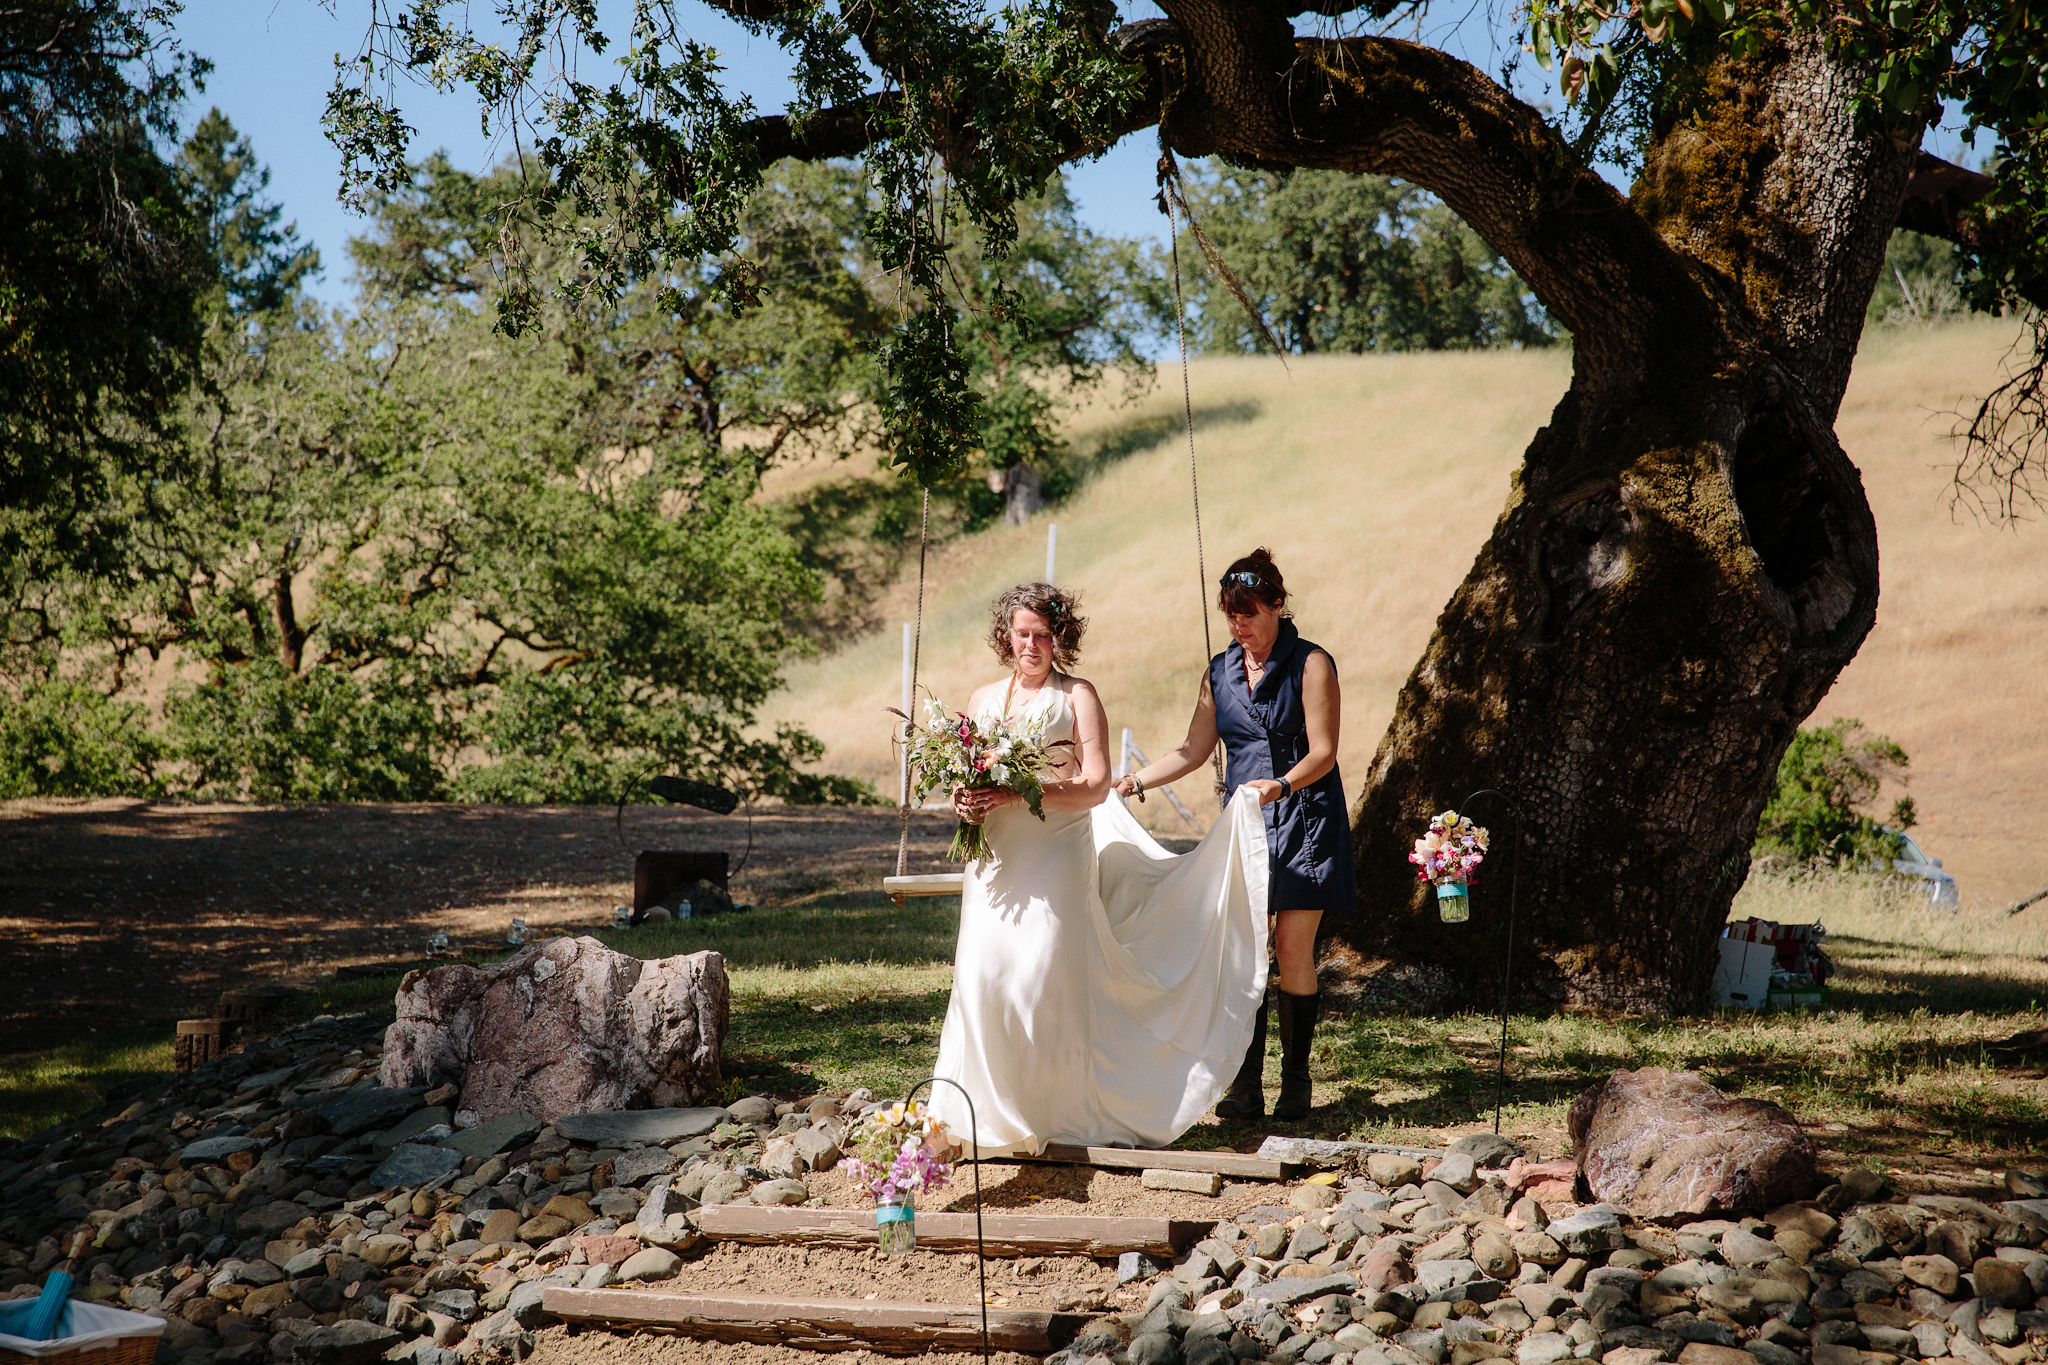 crystalchristiaan_weddingsneakpeek_2014_jenniferleahyphotography-14-of-43_14139974900_o.jpg